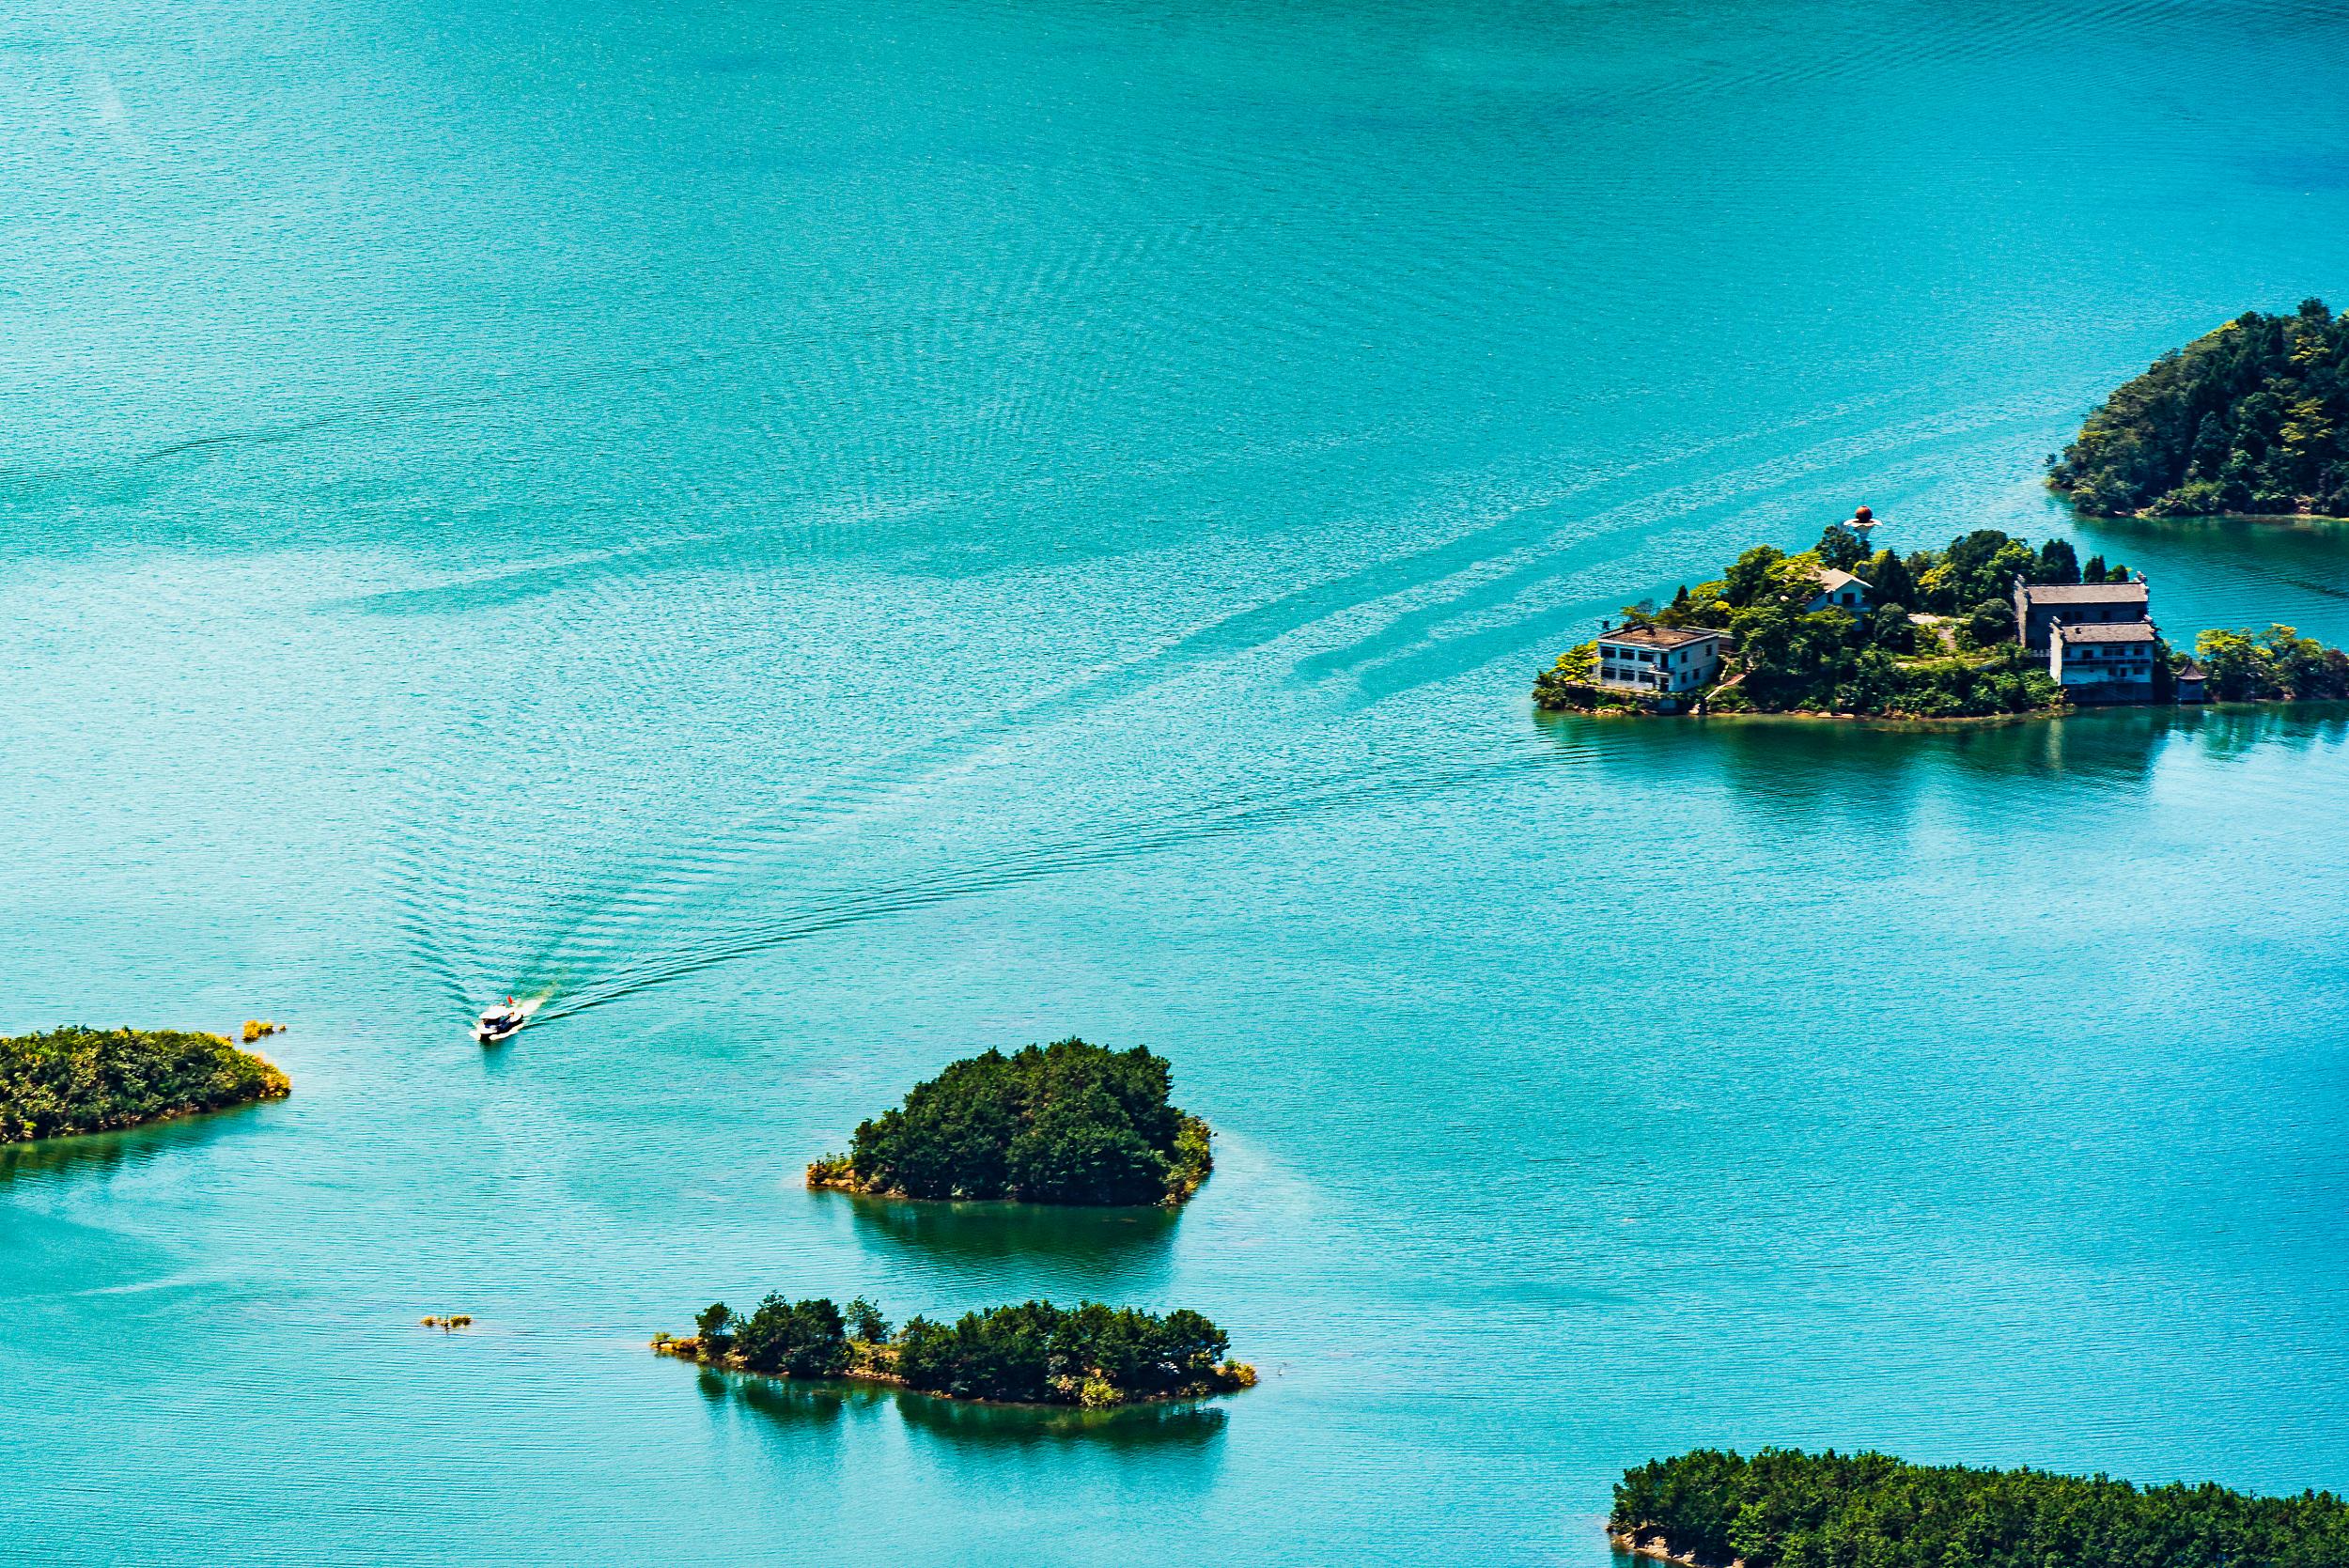 Xiandao Lake Scenic Area